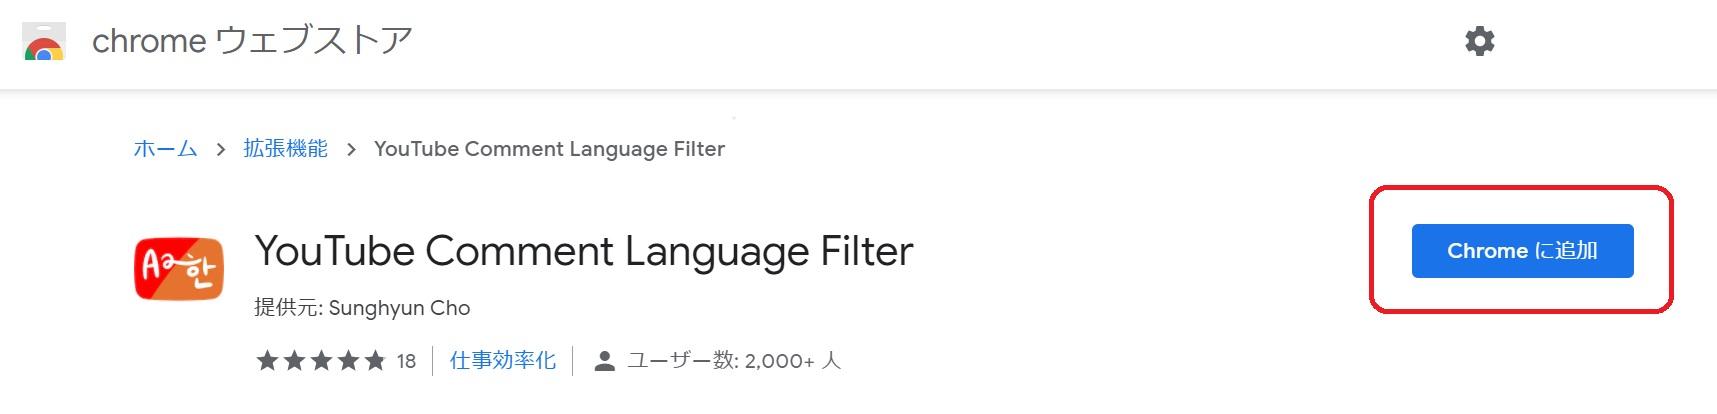 Youtube Comment Language Filter インストール方法